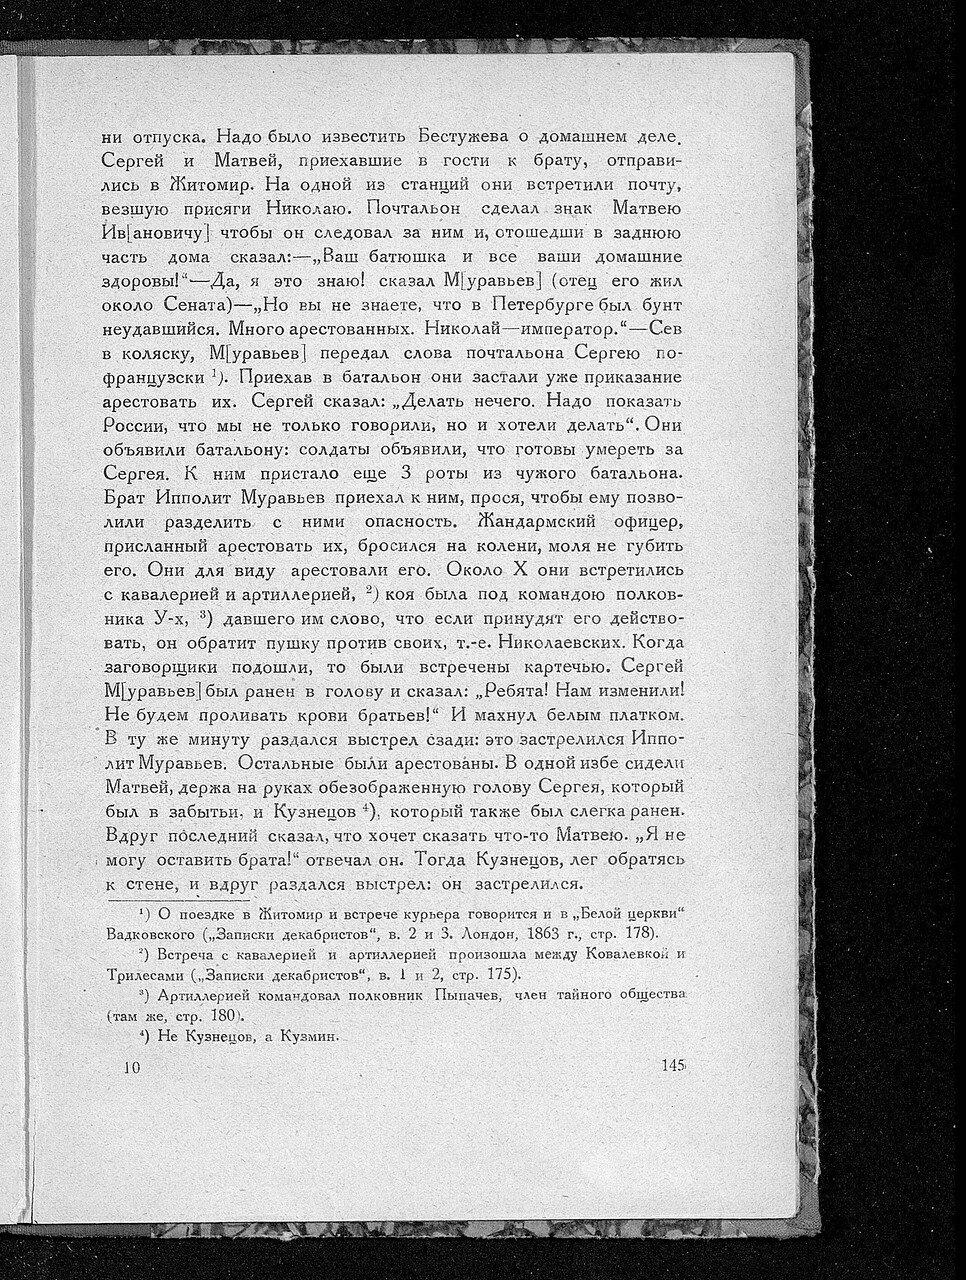 https://img-fotki.yandex.ru/get/370294/199368979.a2/0_21438a_801b7891_XXXL.jpg